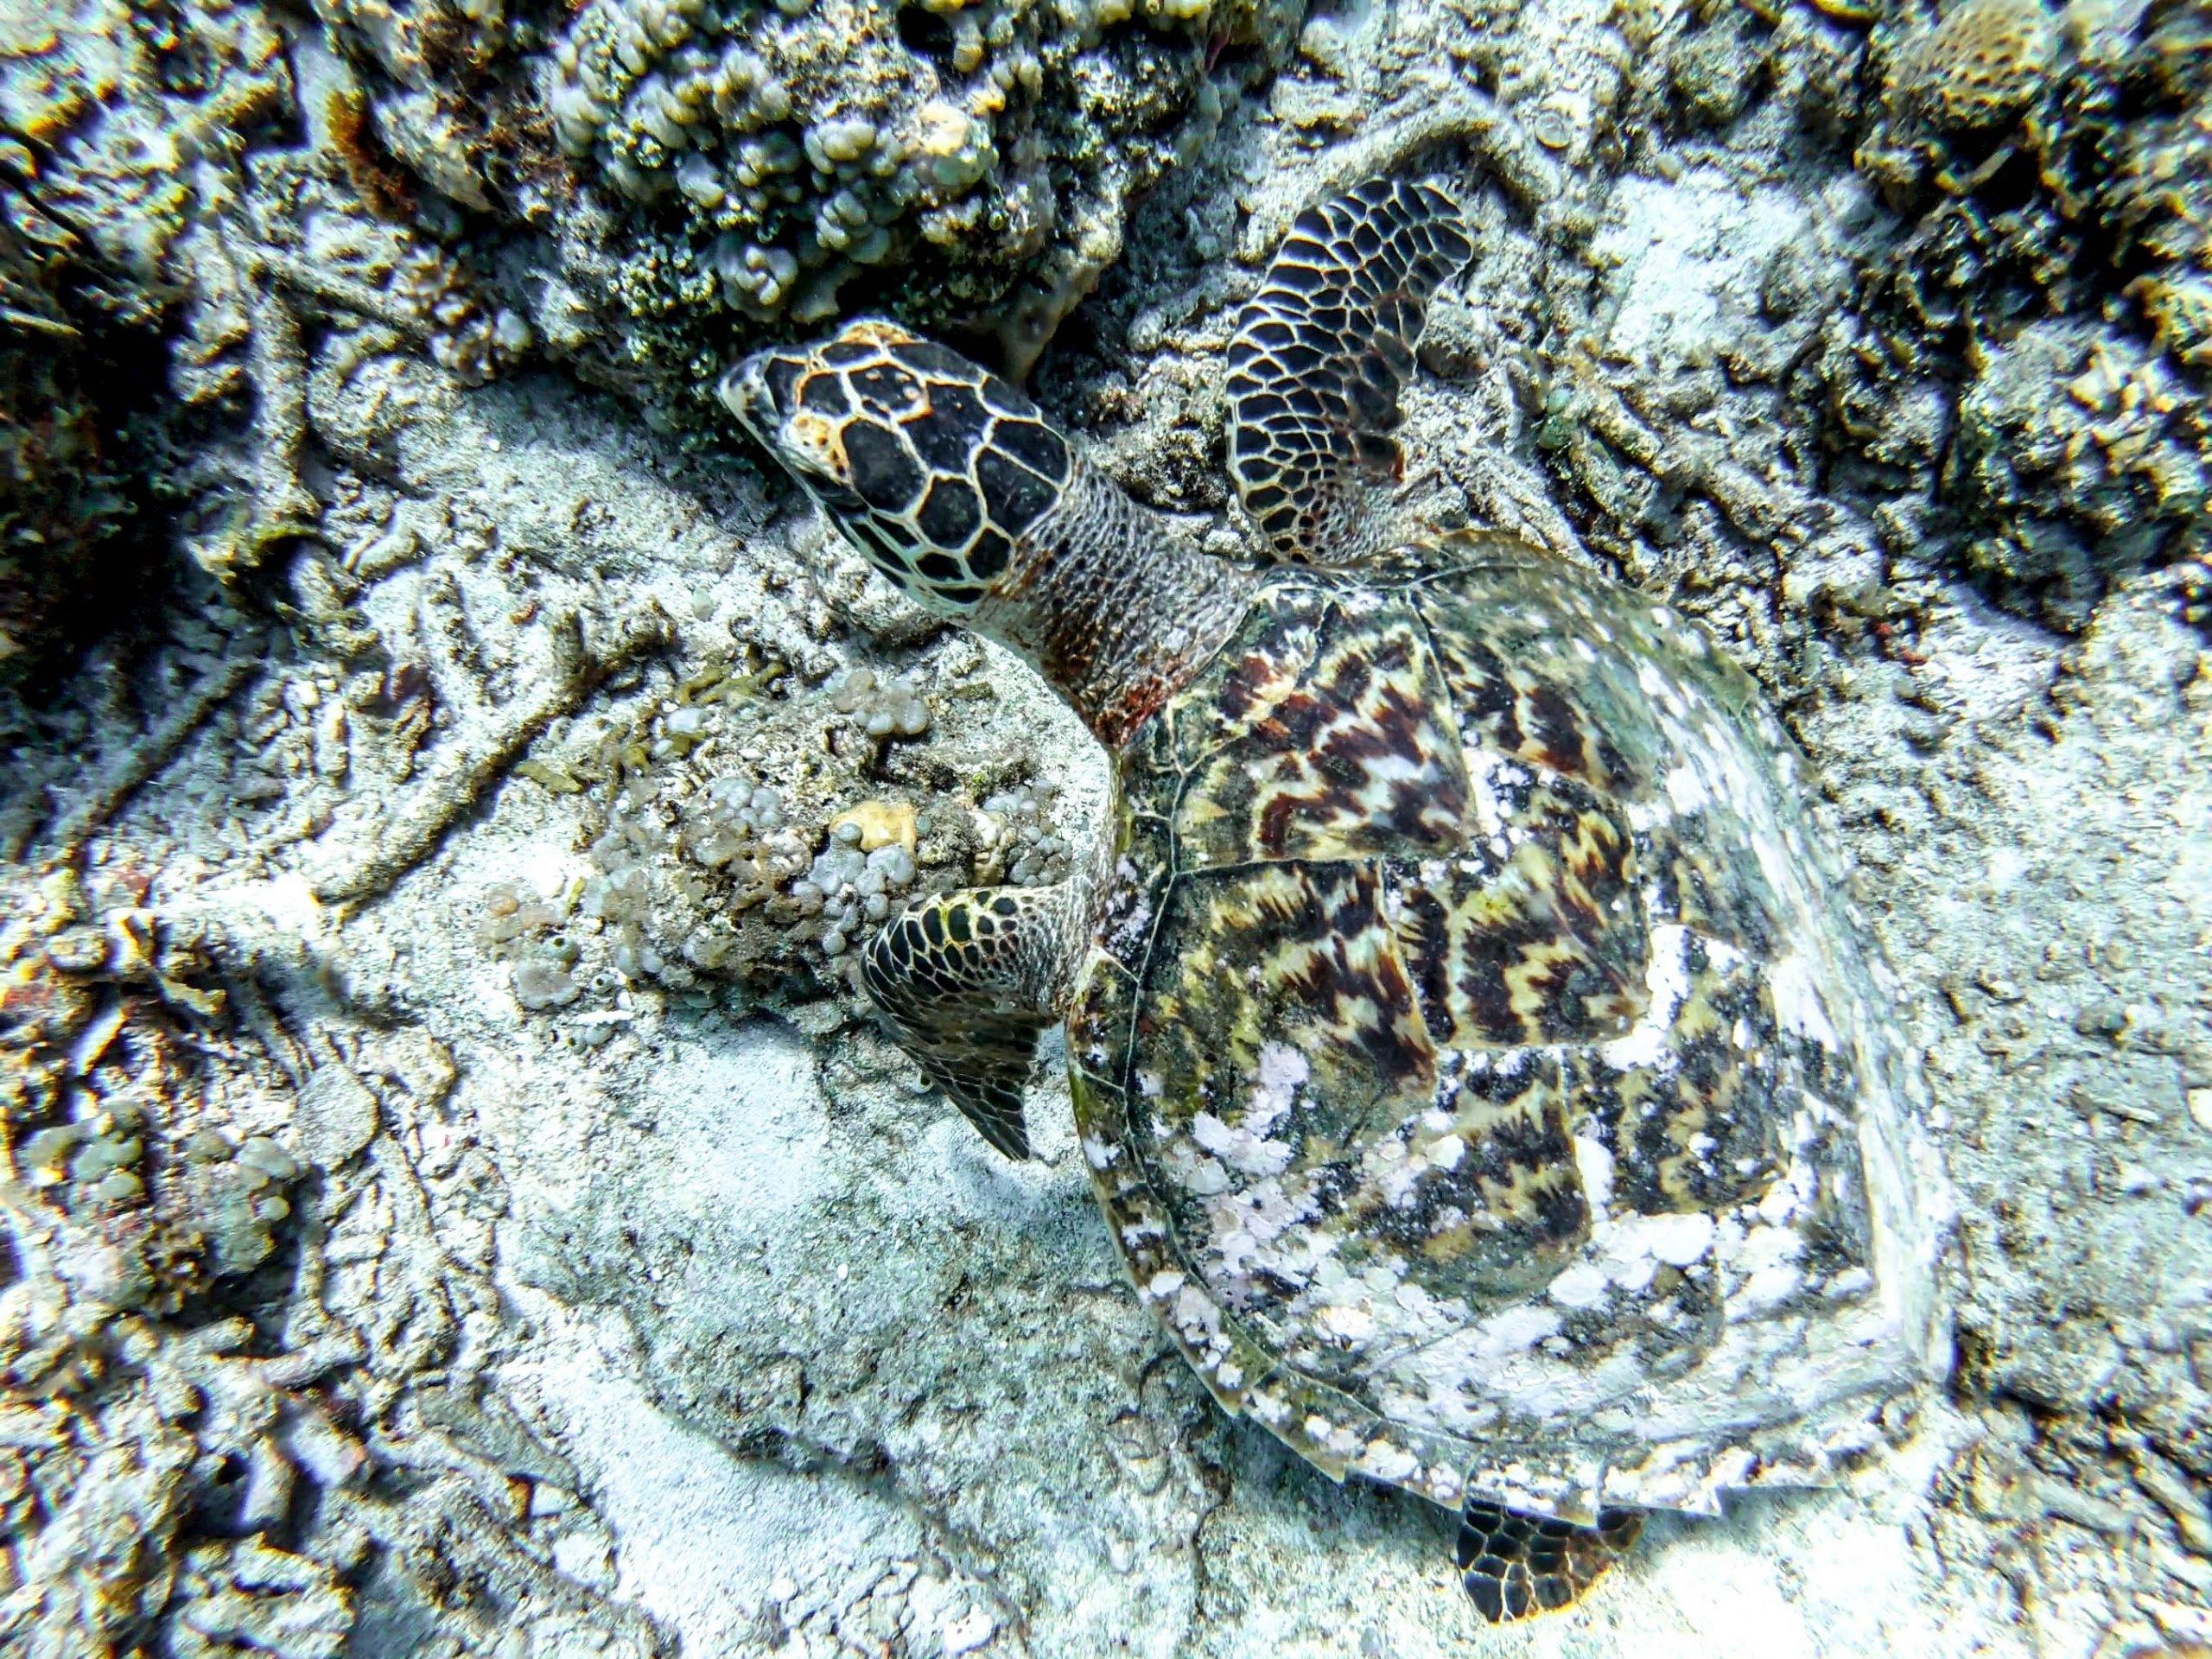 Tortuga en Islas Gili Indonesia